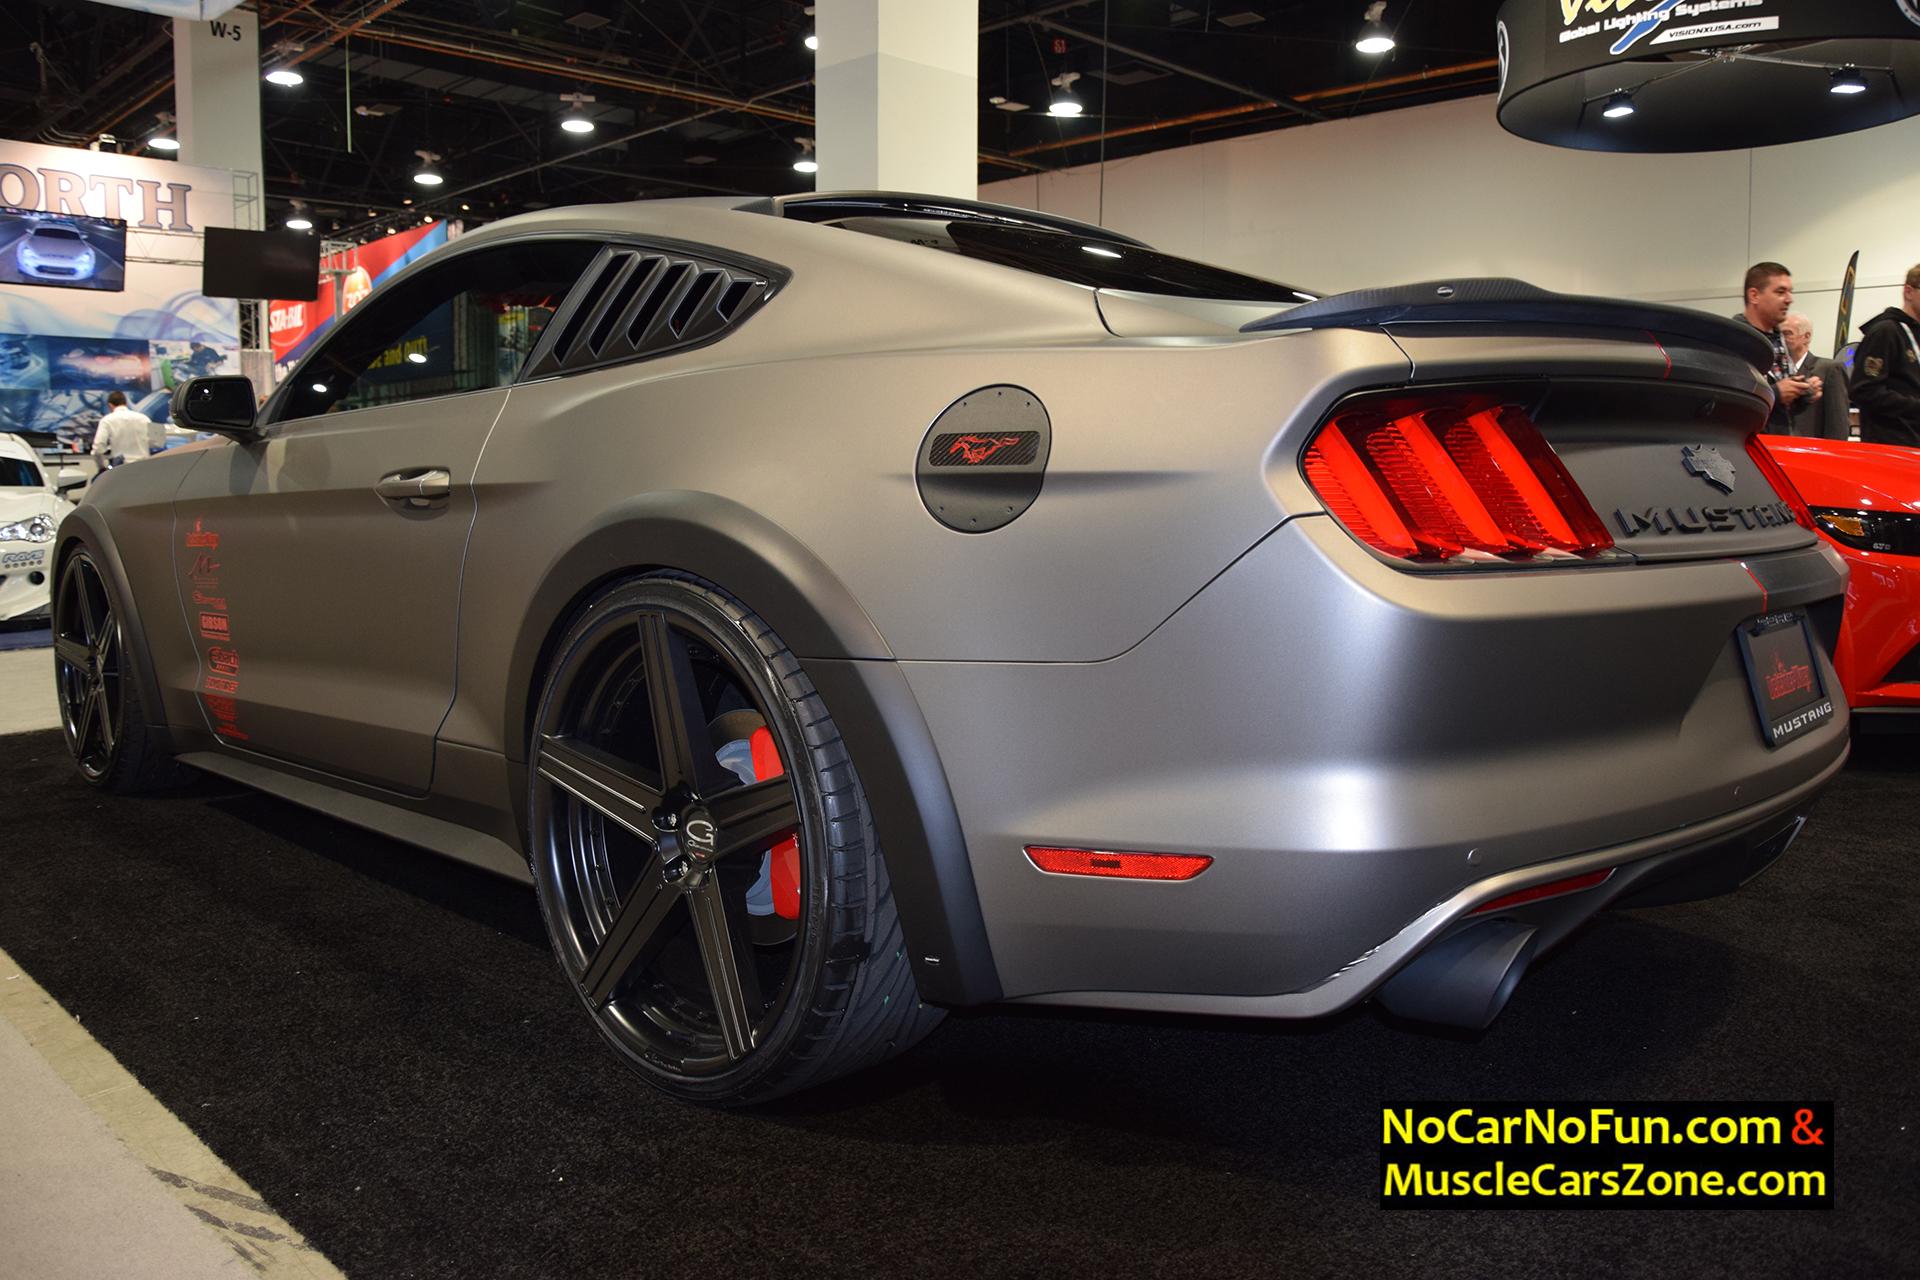 custom ford mustang gt 5 0 defenderworx 2015 sema motor show 5 no car no fun muscle cars. Black Bedroom Furniture Sets. Home Design Ideas